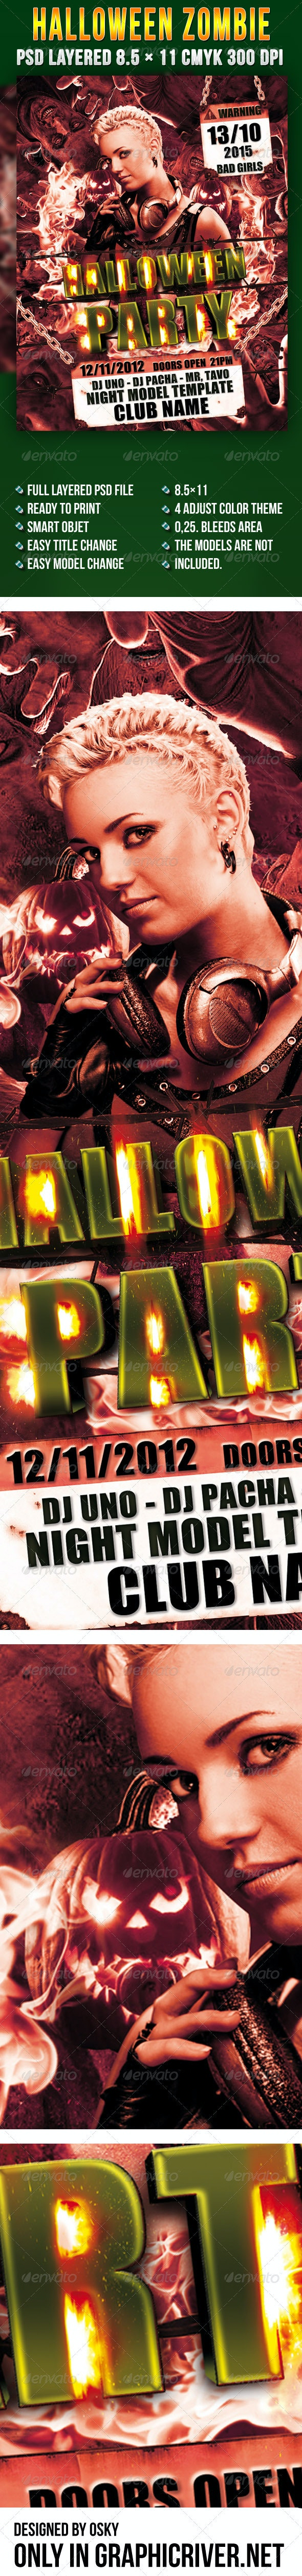 Halloween Zombie Flyer - Clubs & Parties Events